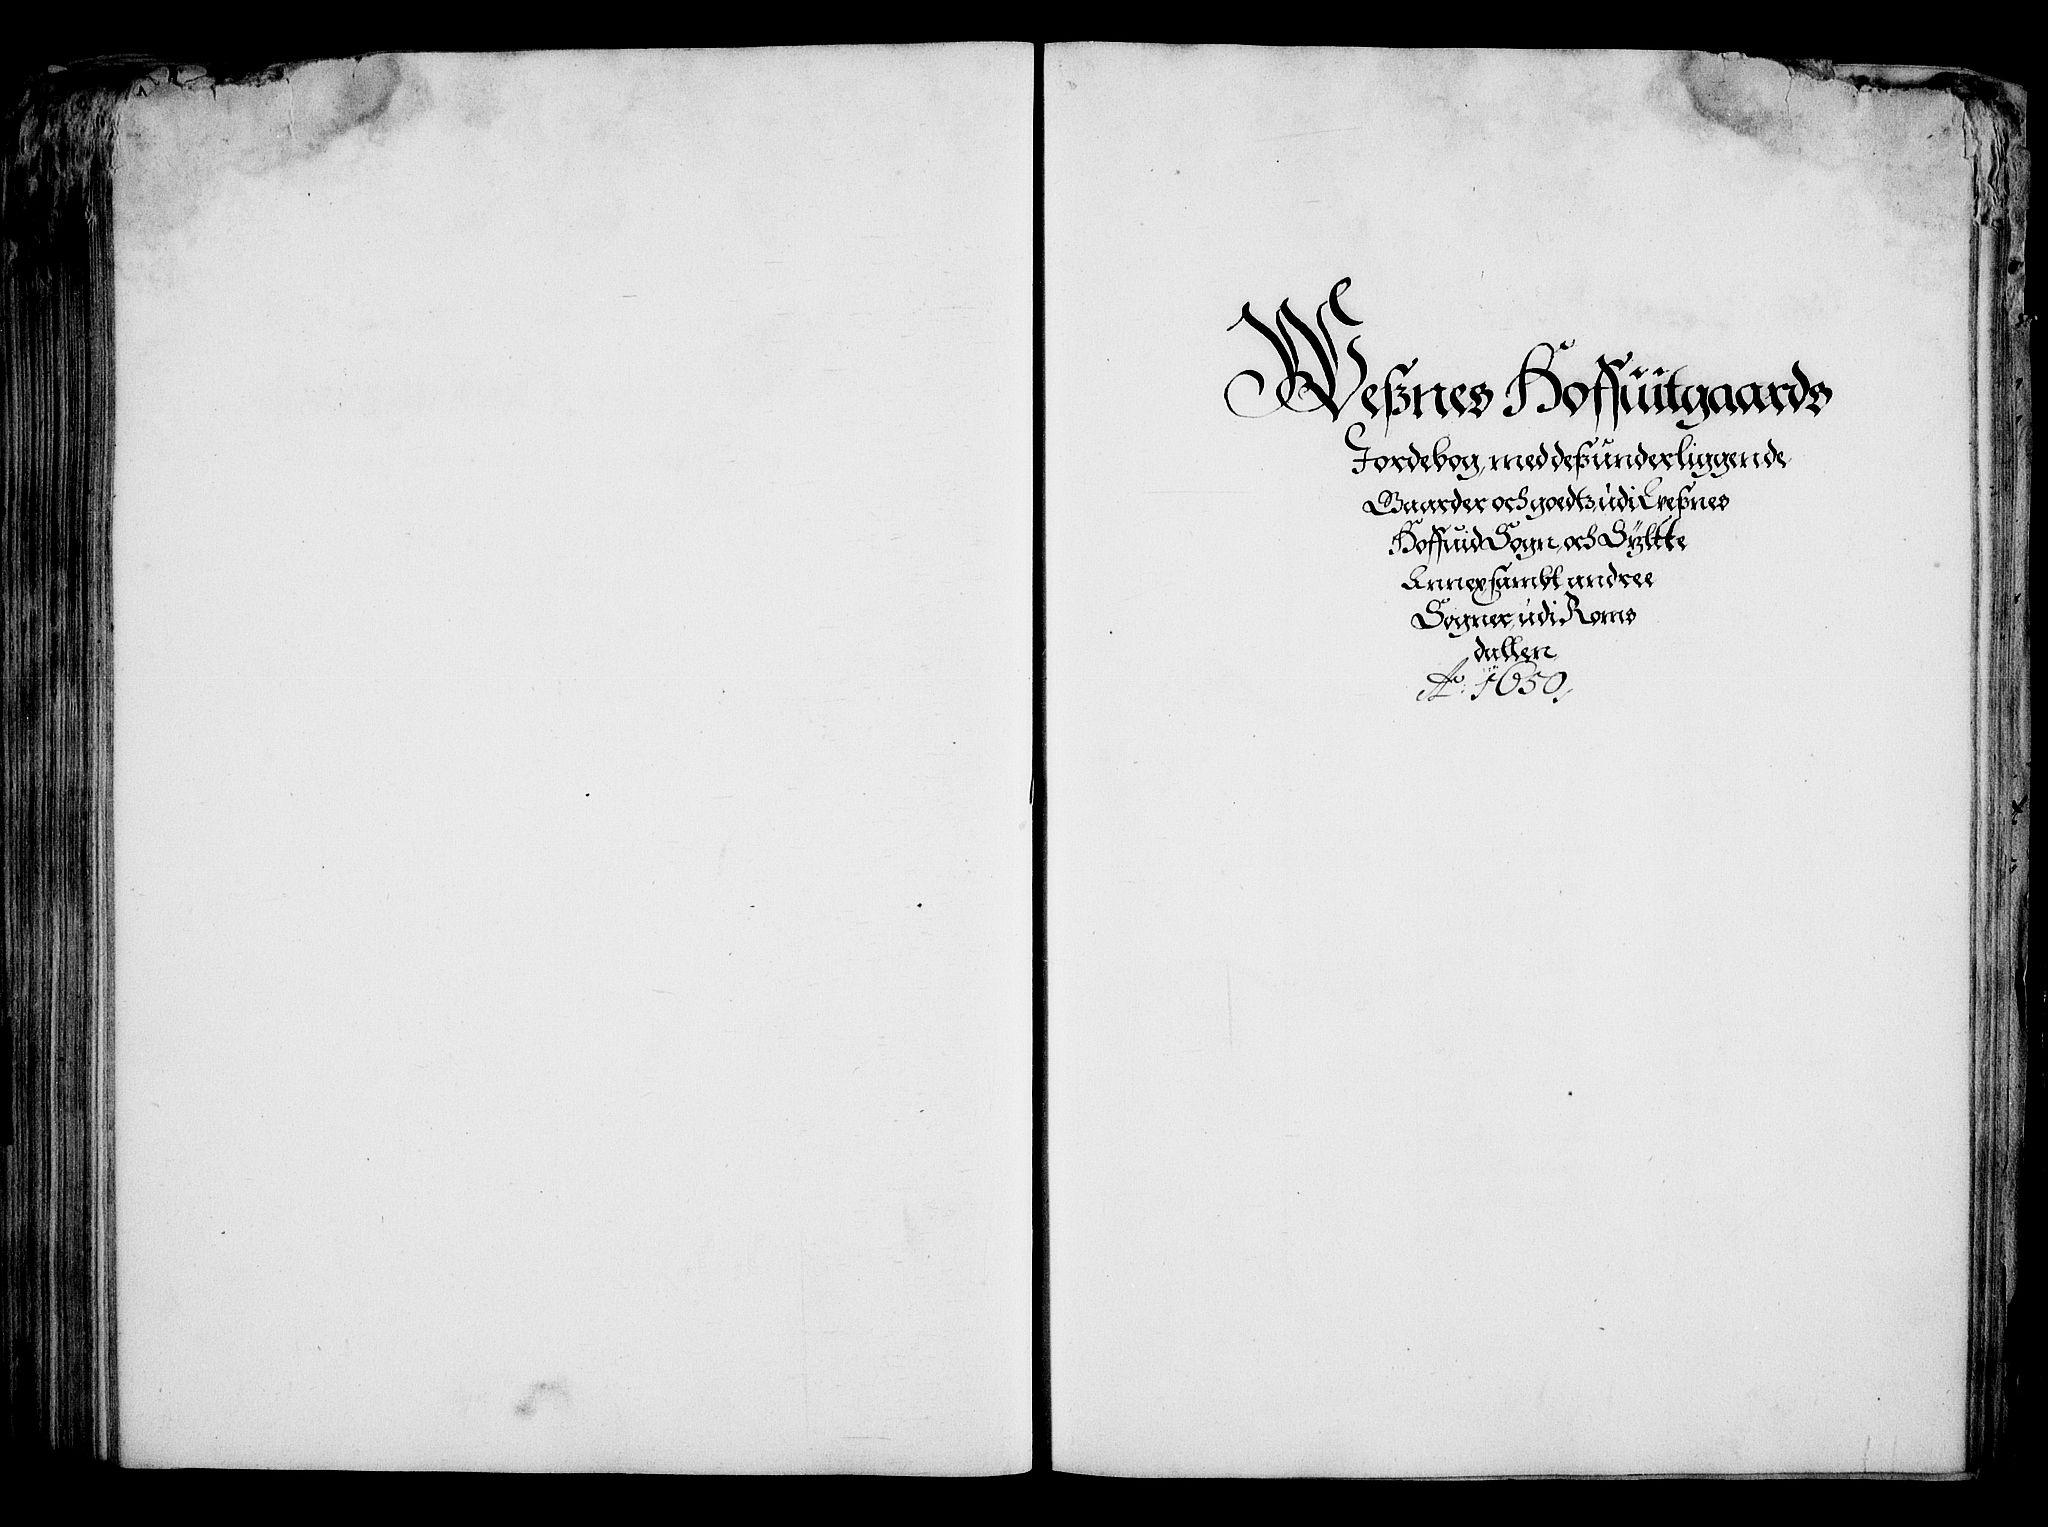 RA, Rentekammeret inntil 1814, Realistisk ordnet avdeling, On/L0001: Statens gods, 1651, s. 201